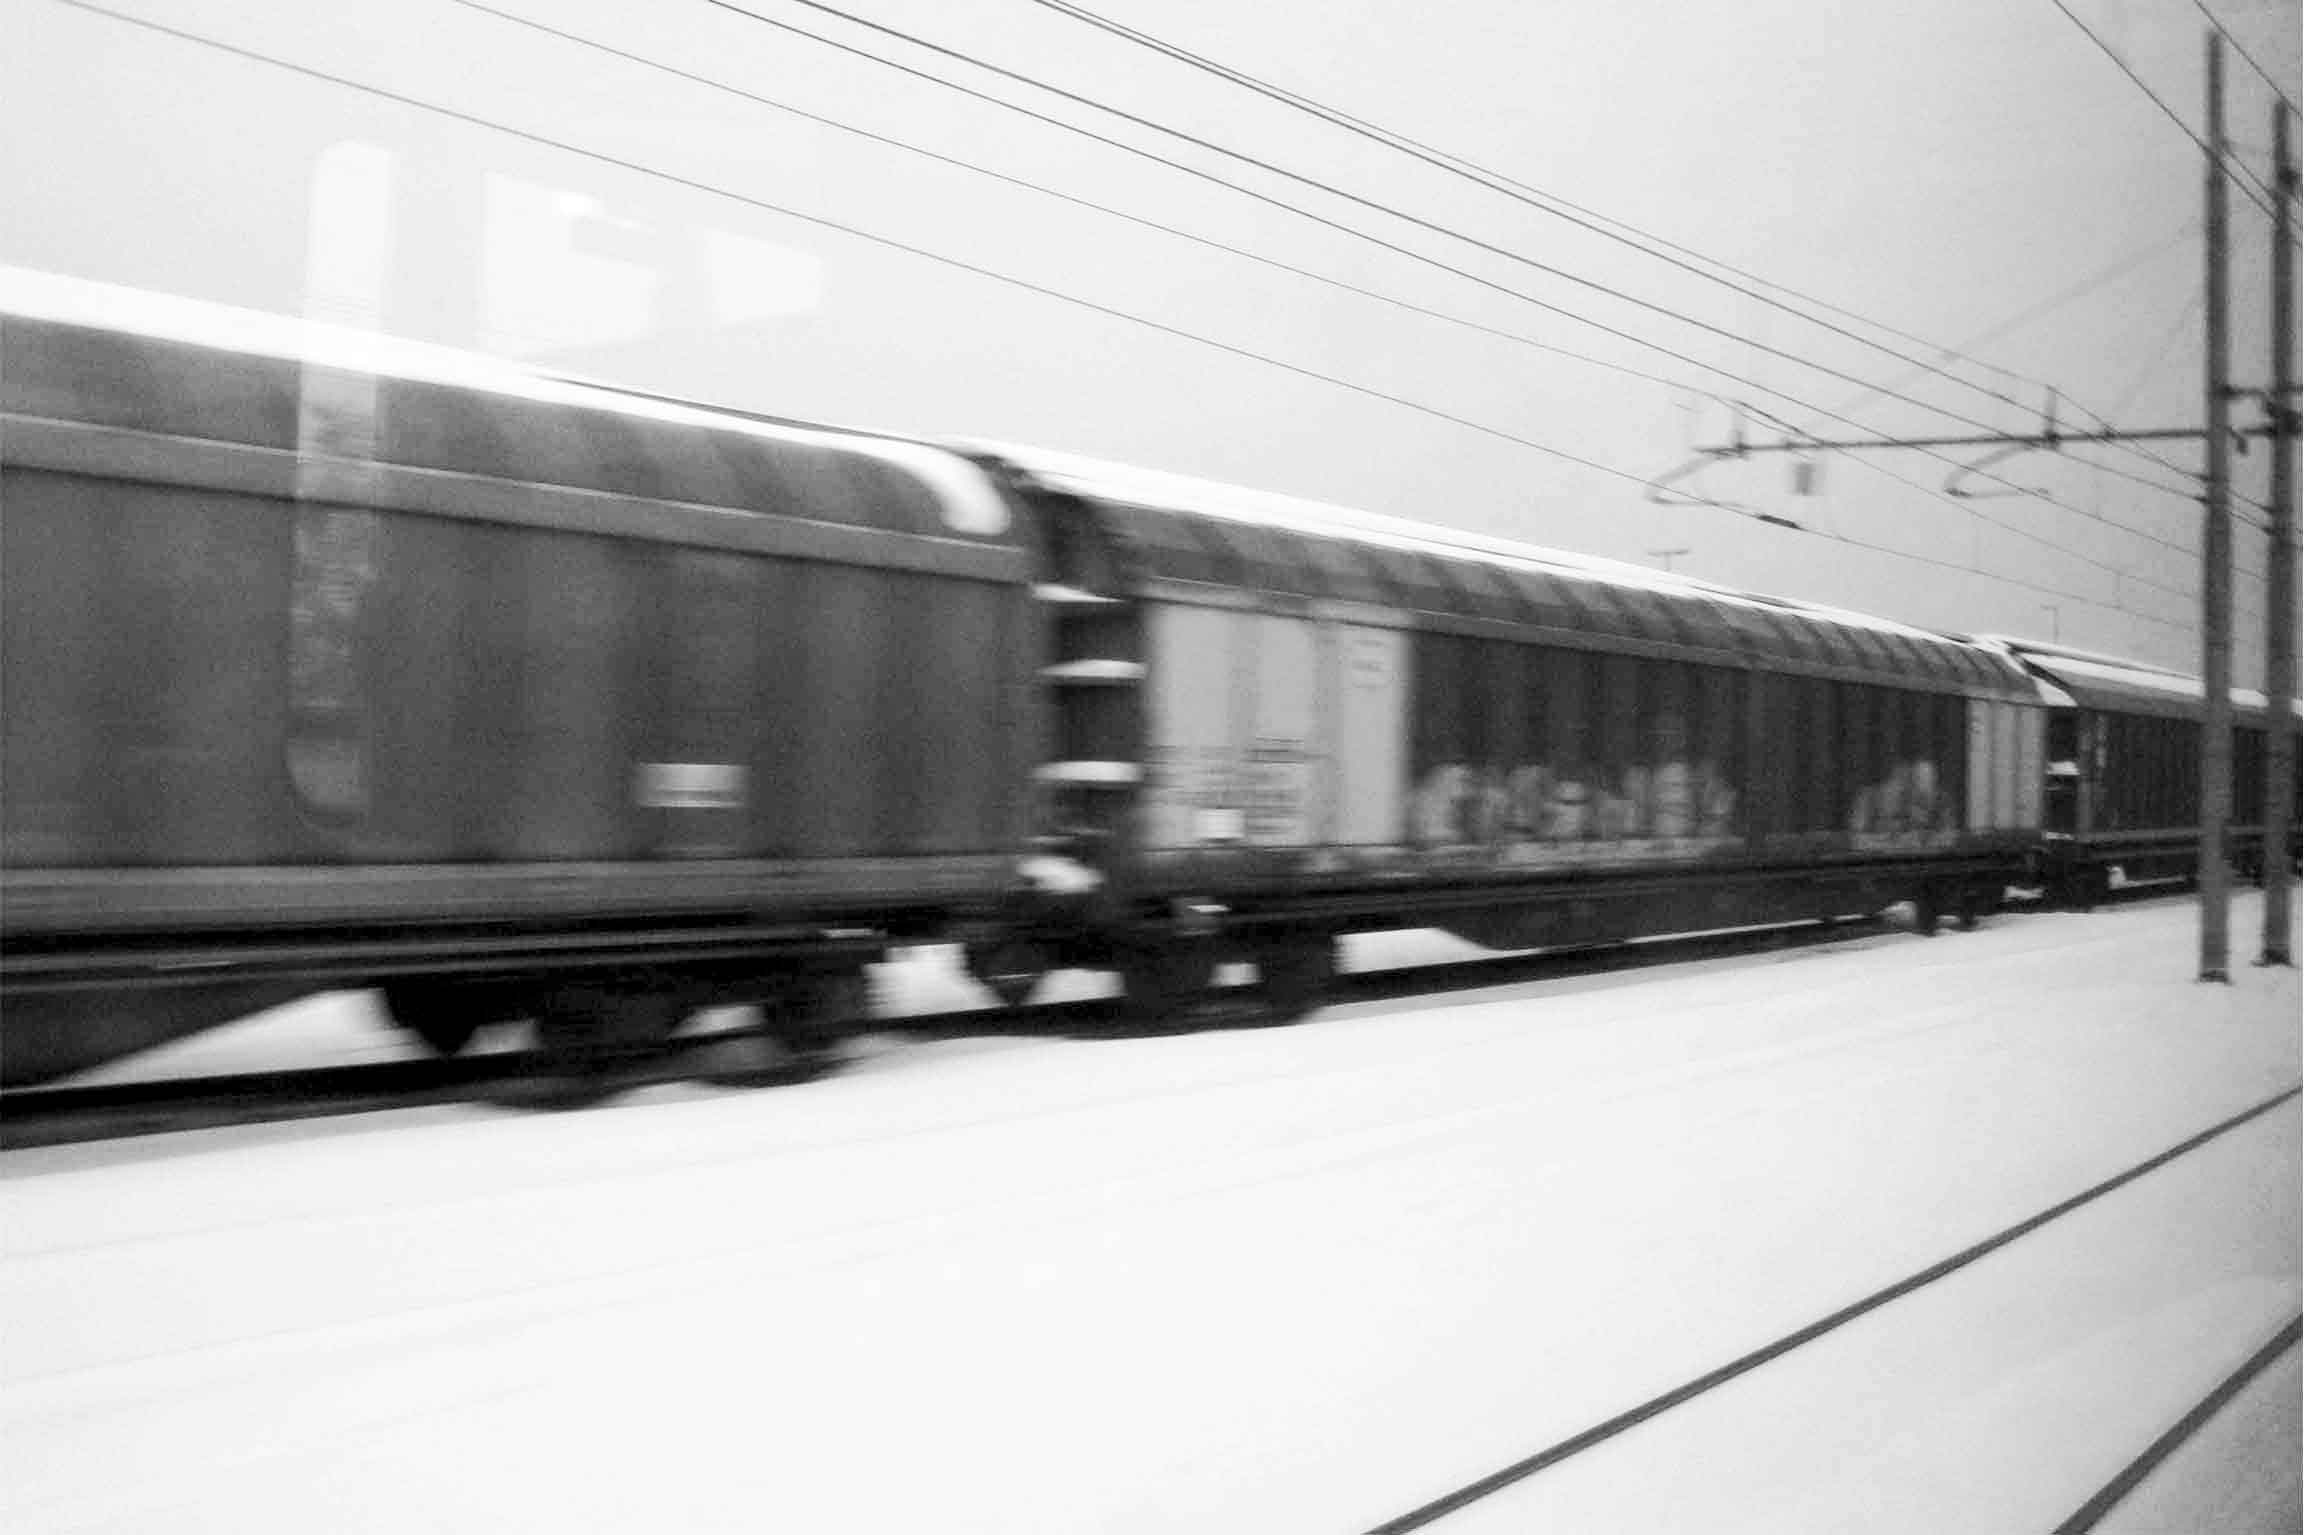 trains_bw_web.jpg